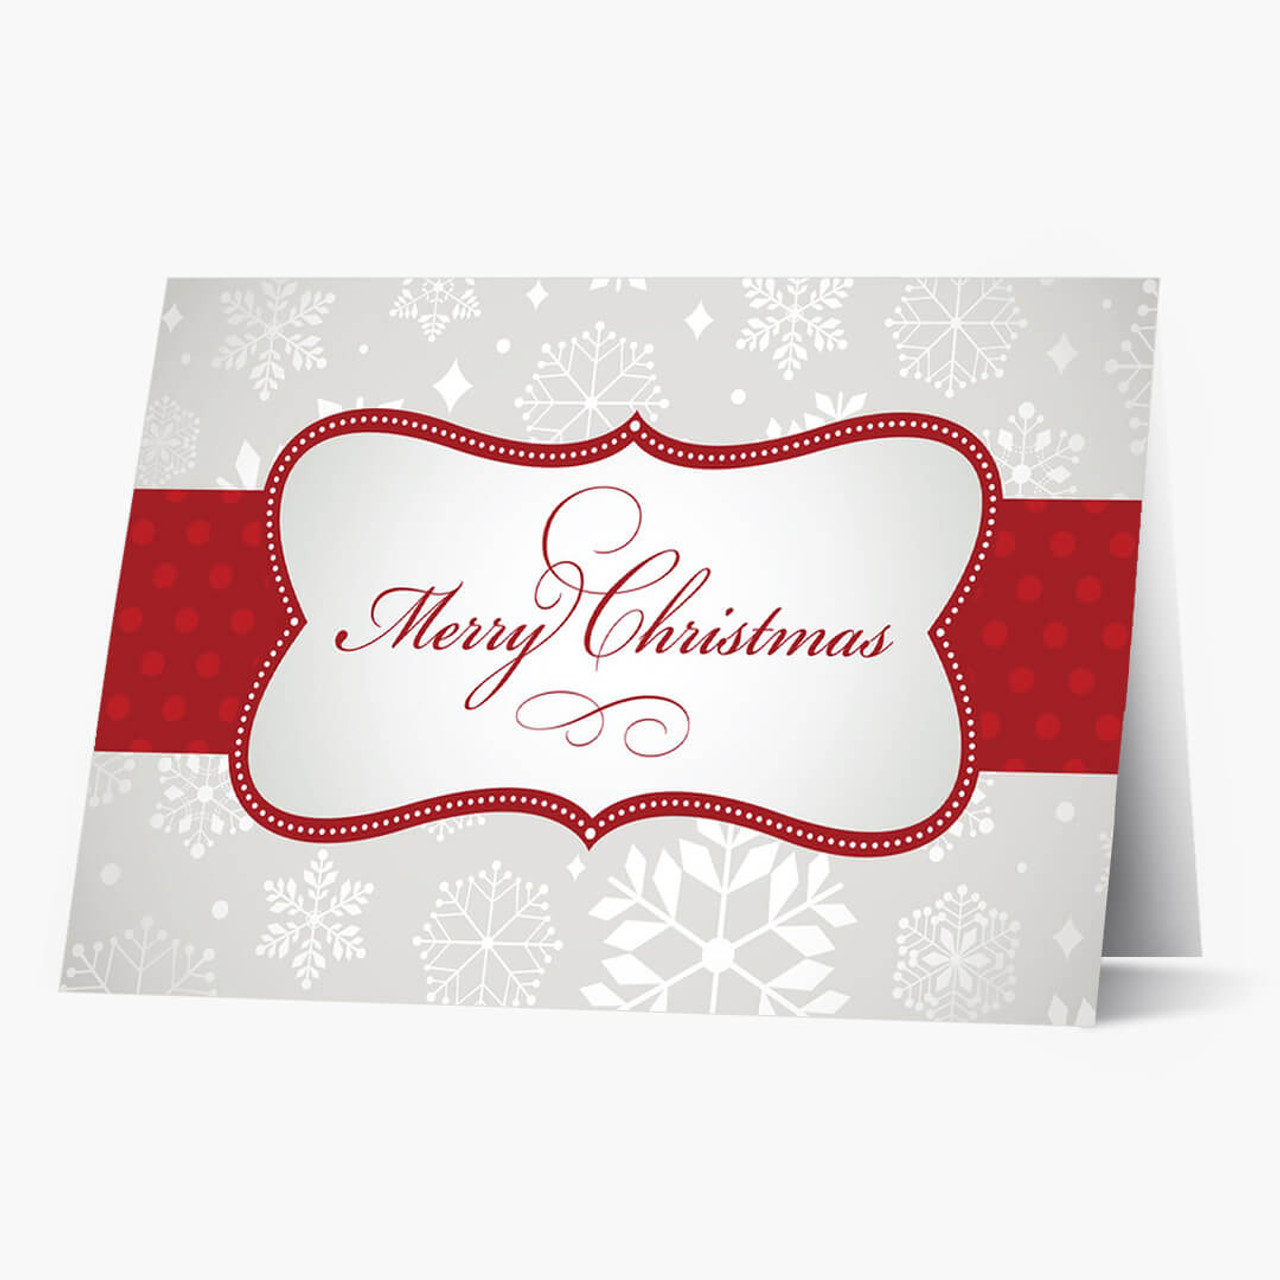 Presenting Merry Christmas Card